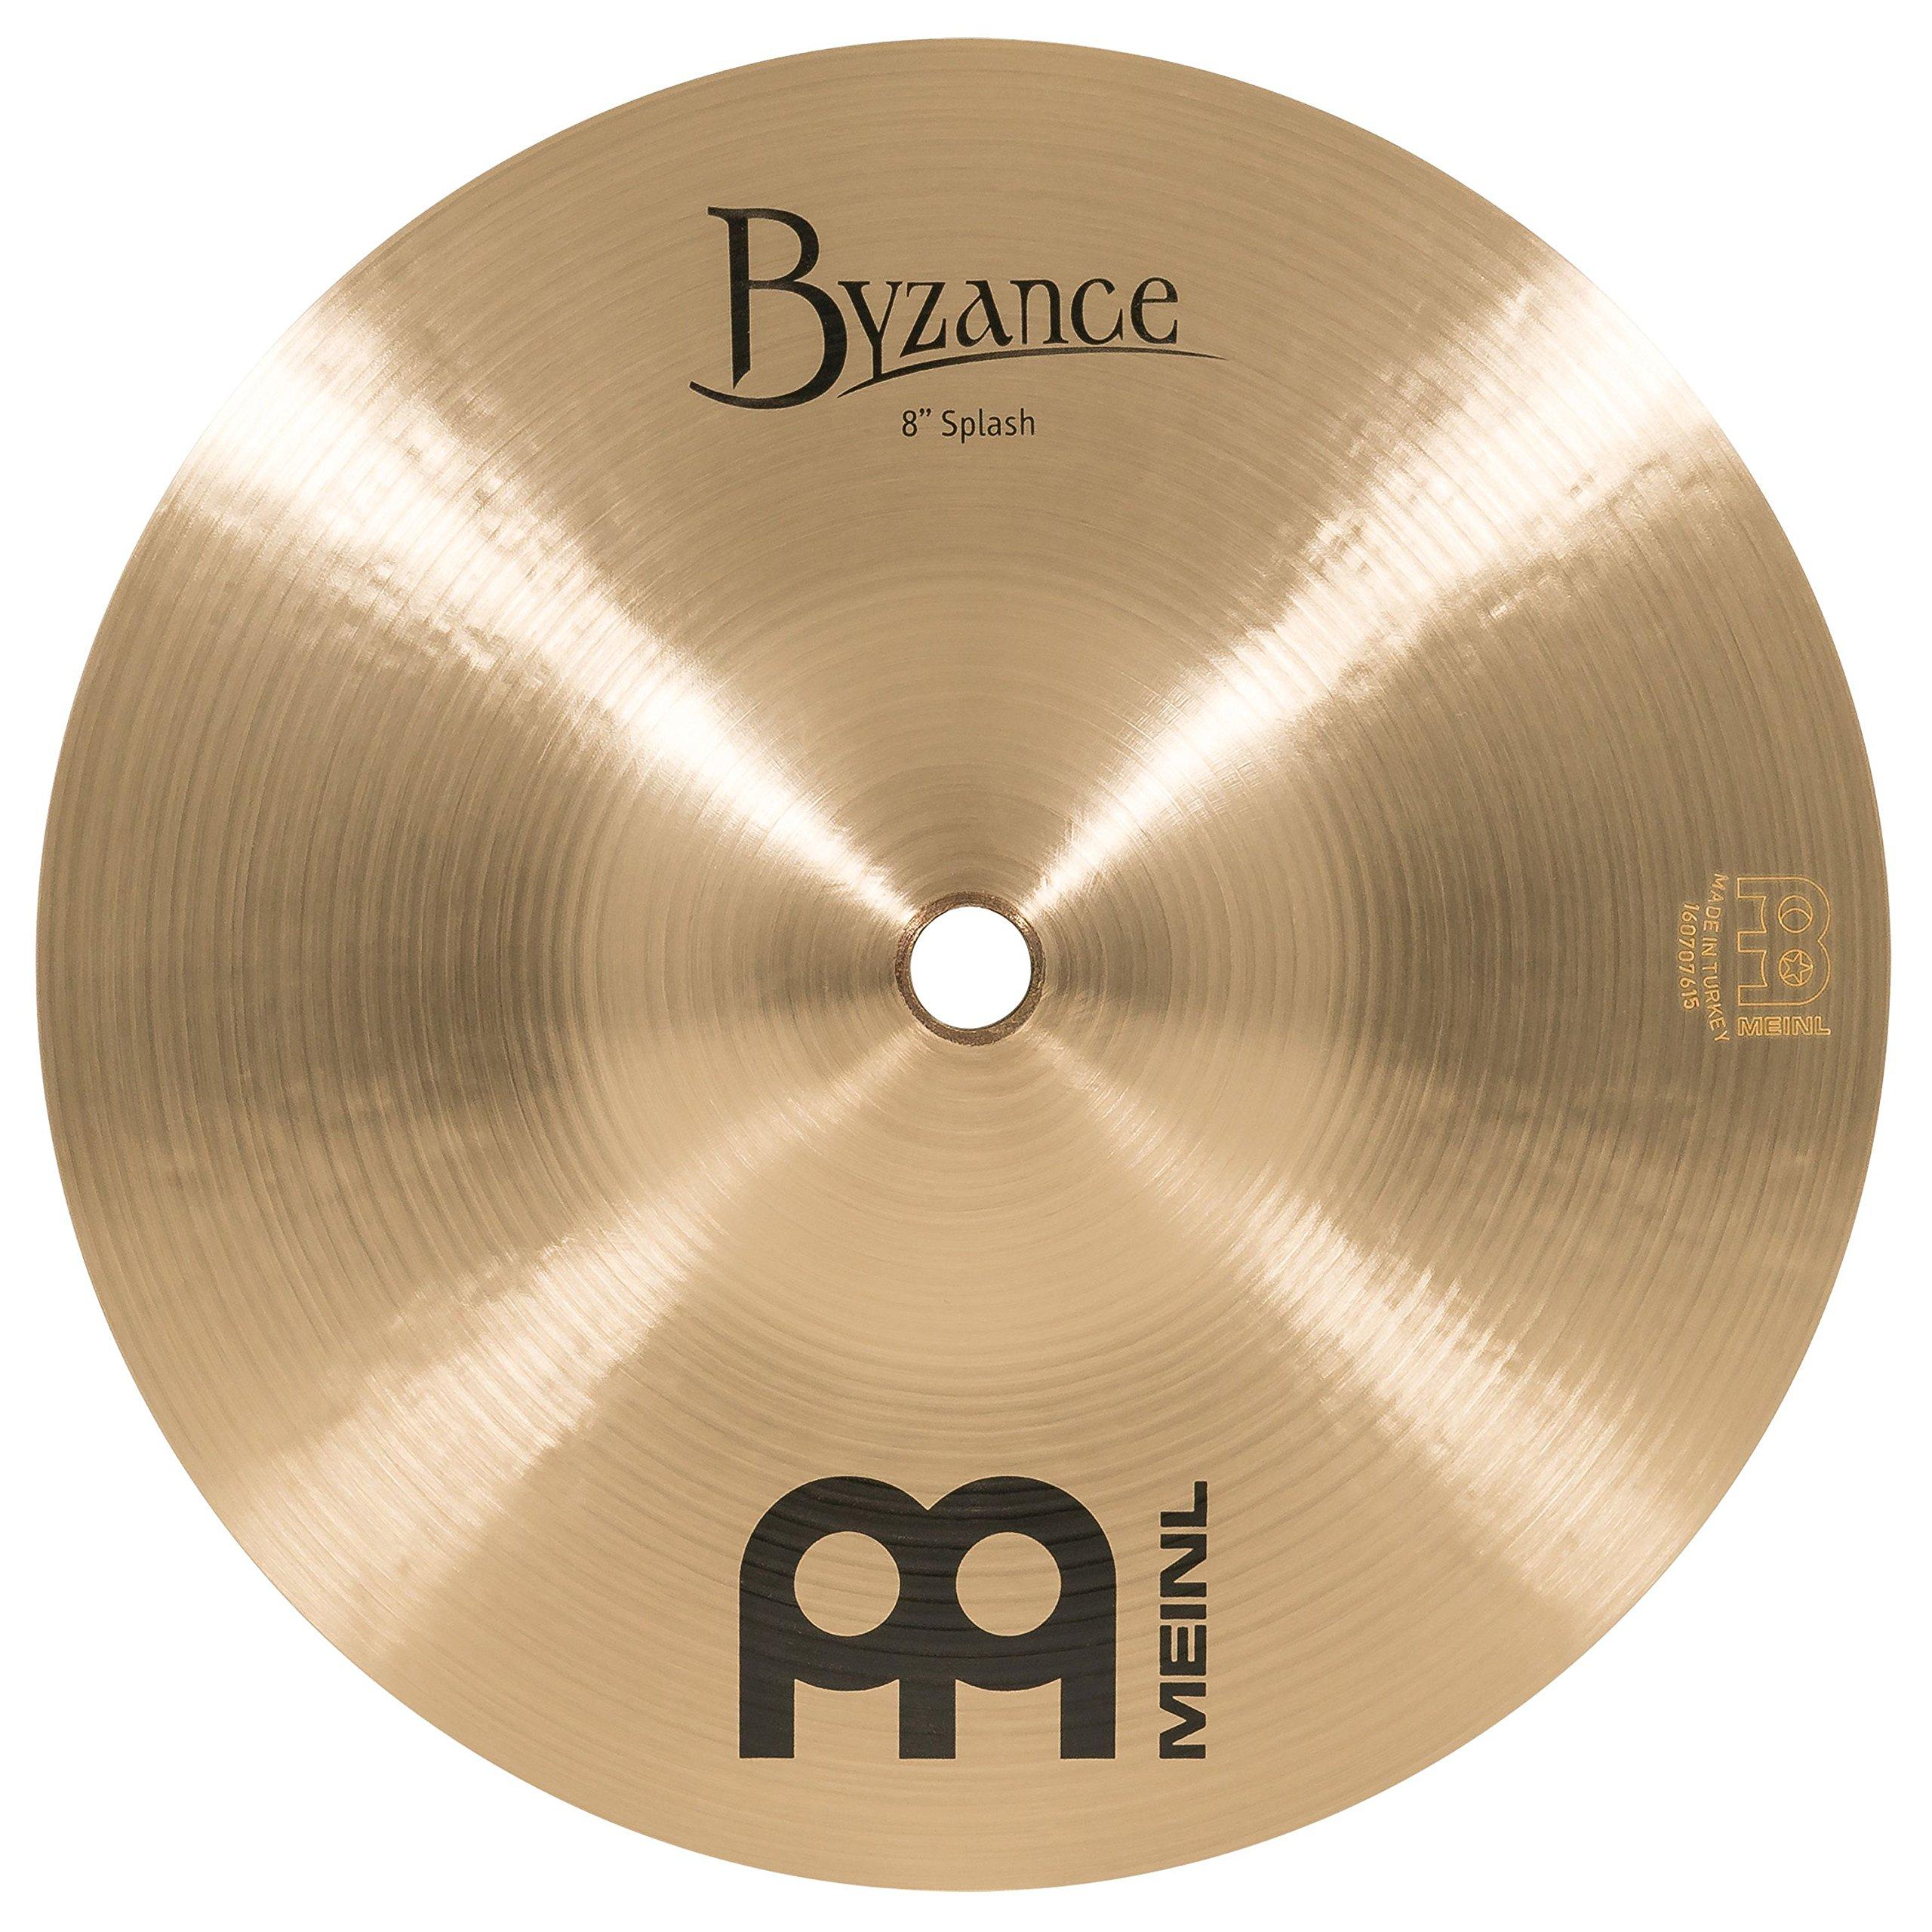 Meinl Cymbals B8S Byzance 8-Inch Traditional Splash Cymbal (VIDEO) by Meinl Cymbals